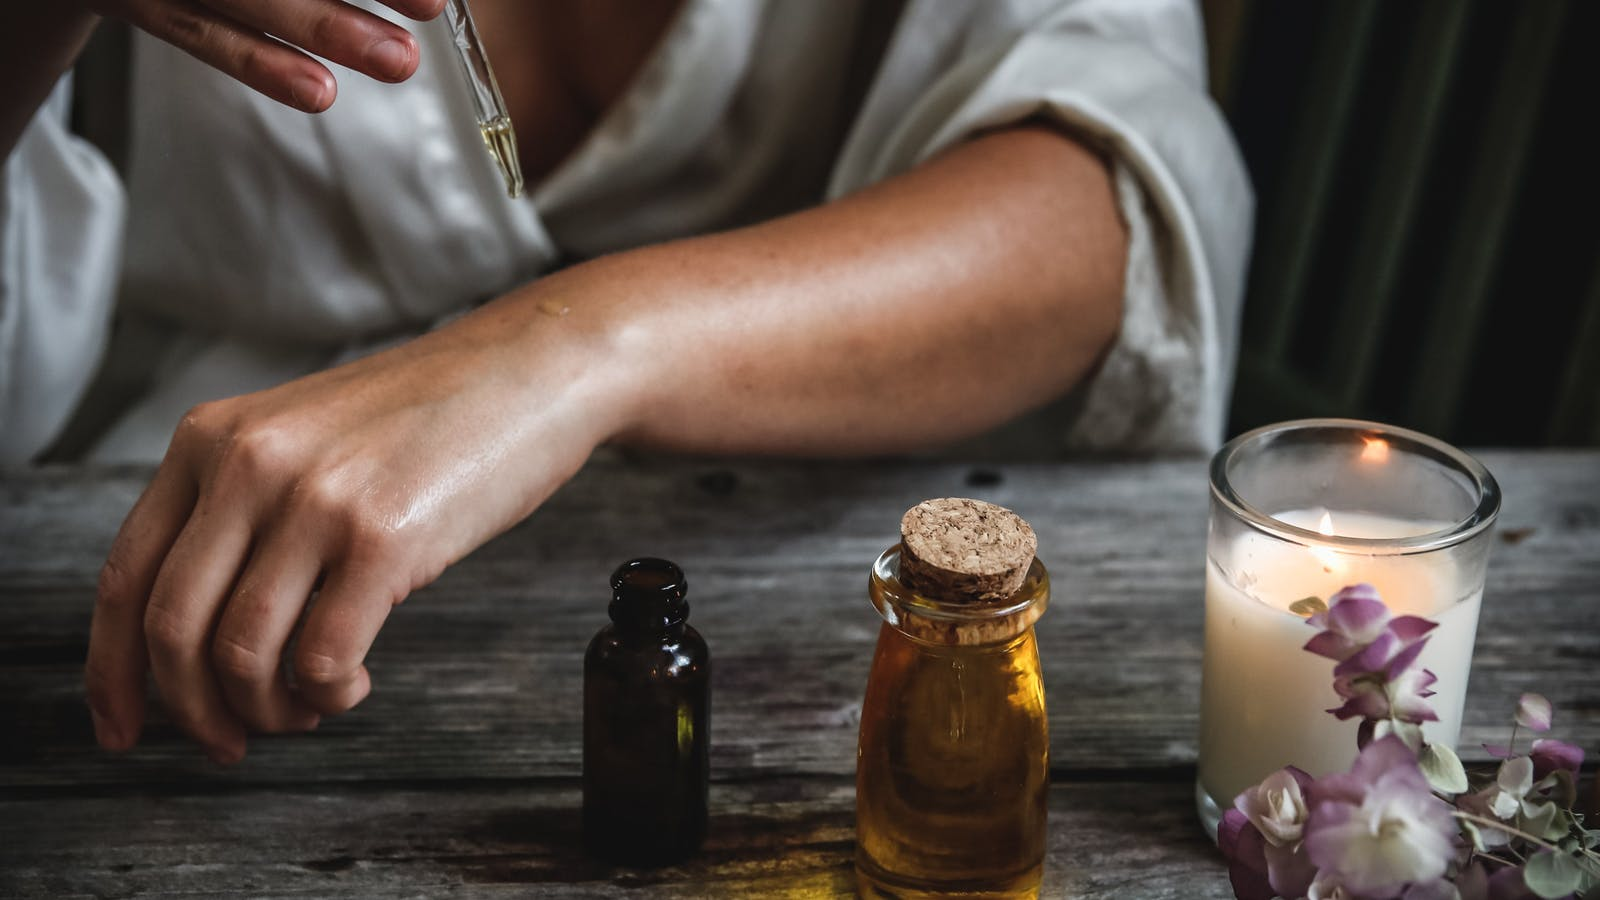 huiles essentielles et bougie